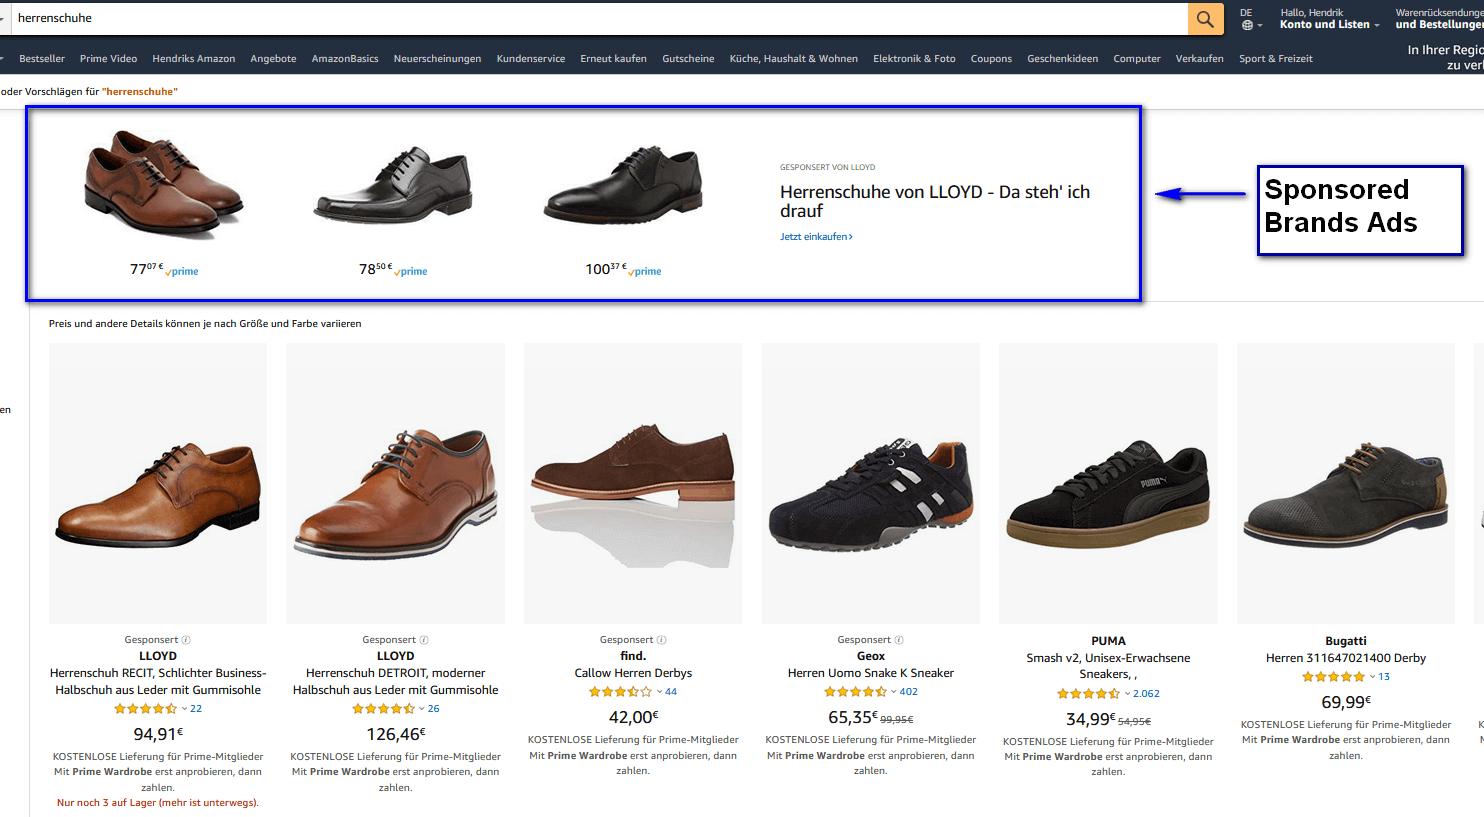 Screenshot Sponsored Brands Ads